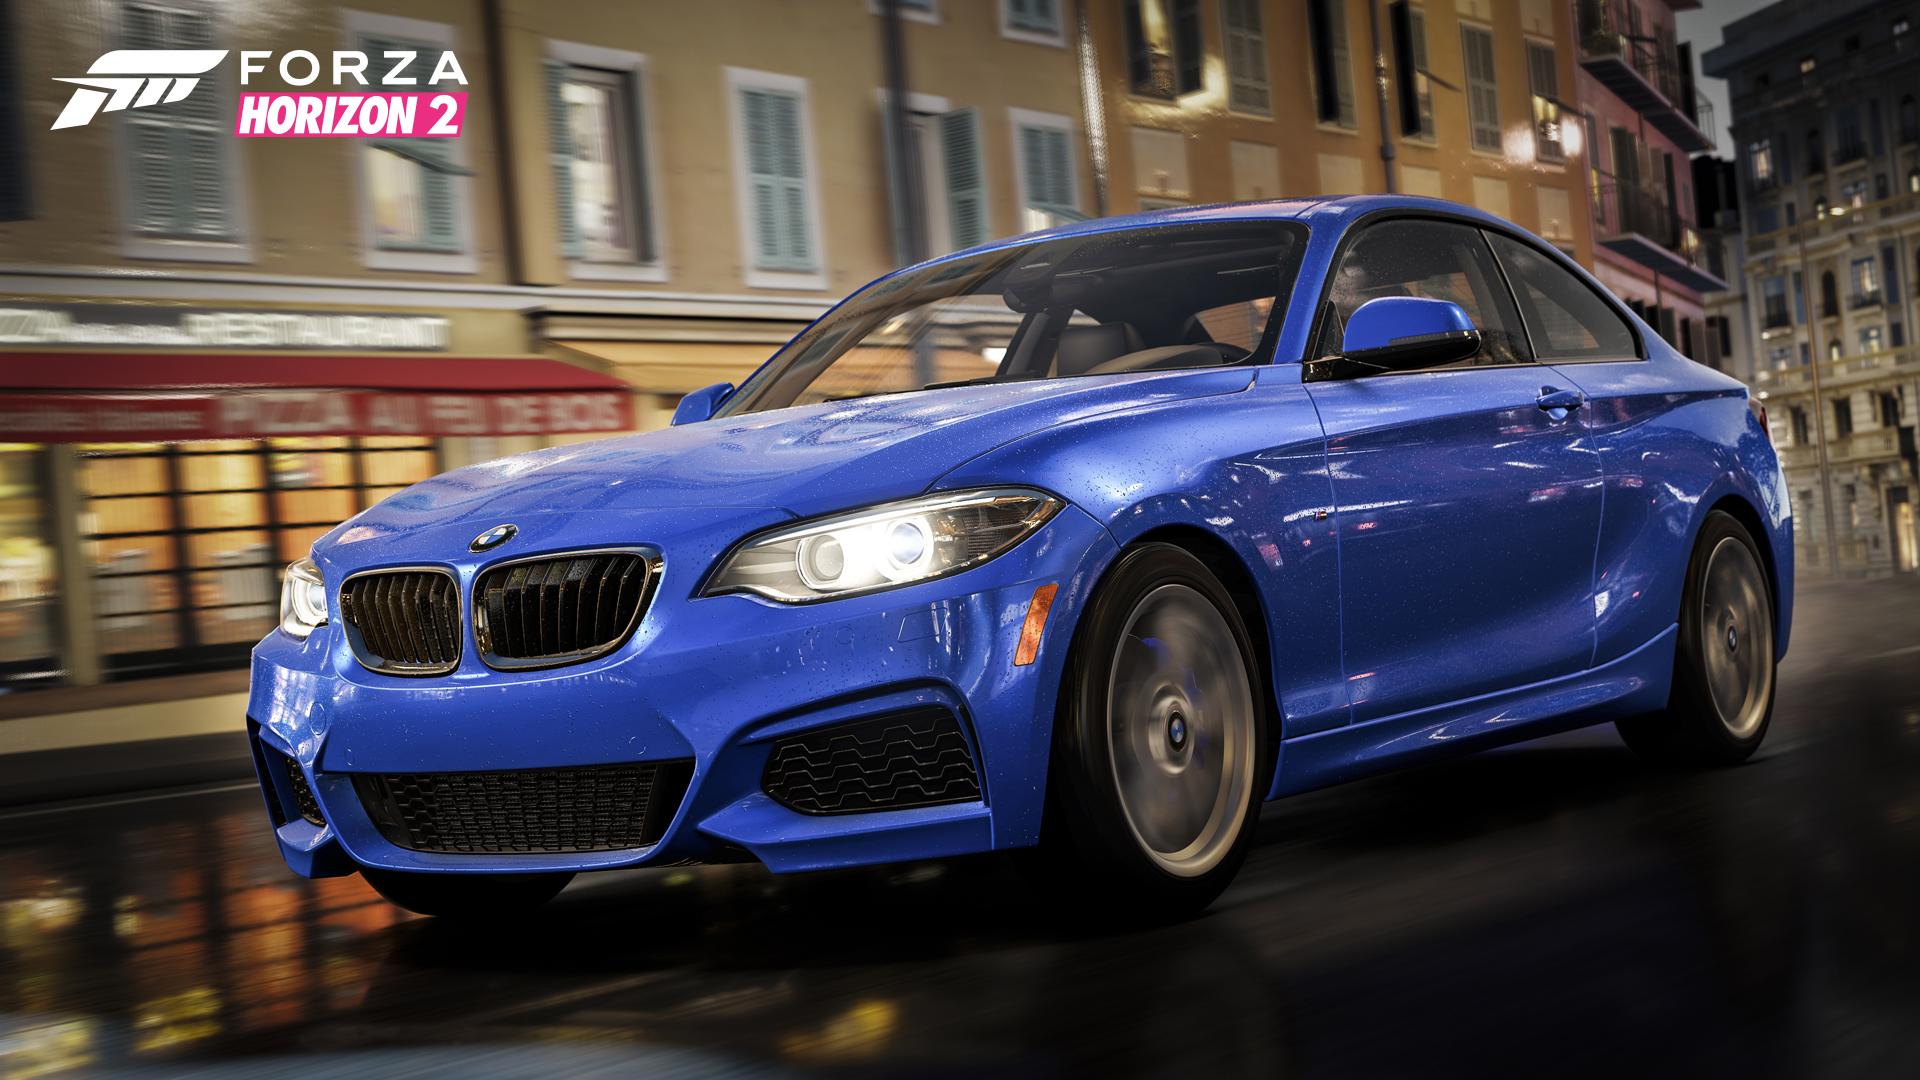 Vyšel balíček Top Gear pro Forza Horizon 2 105499